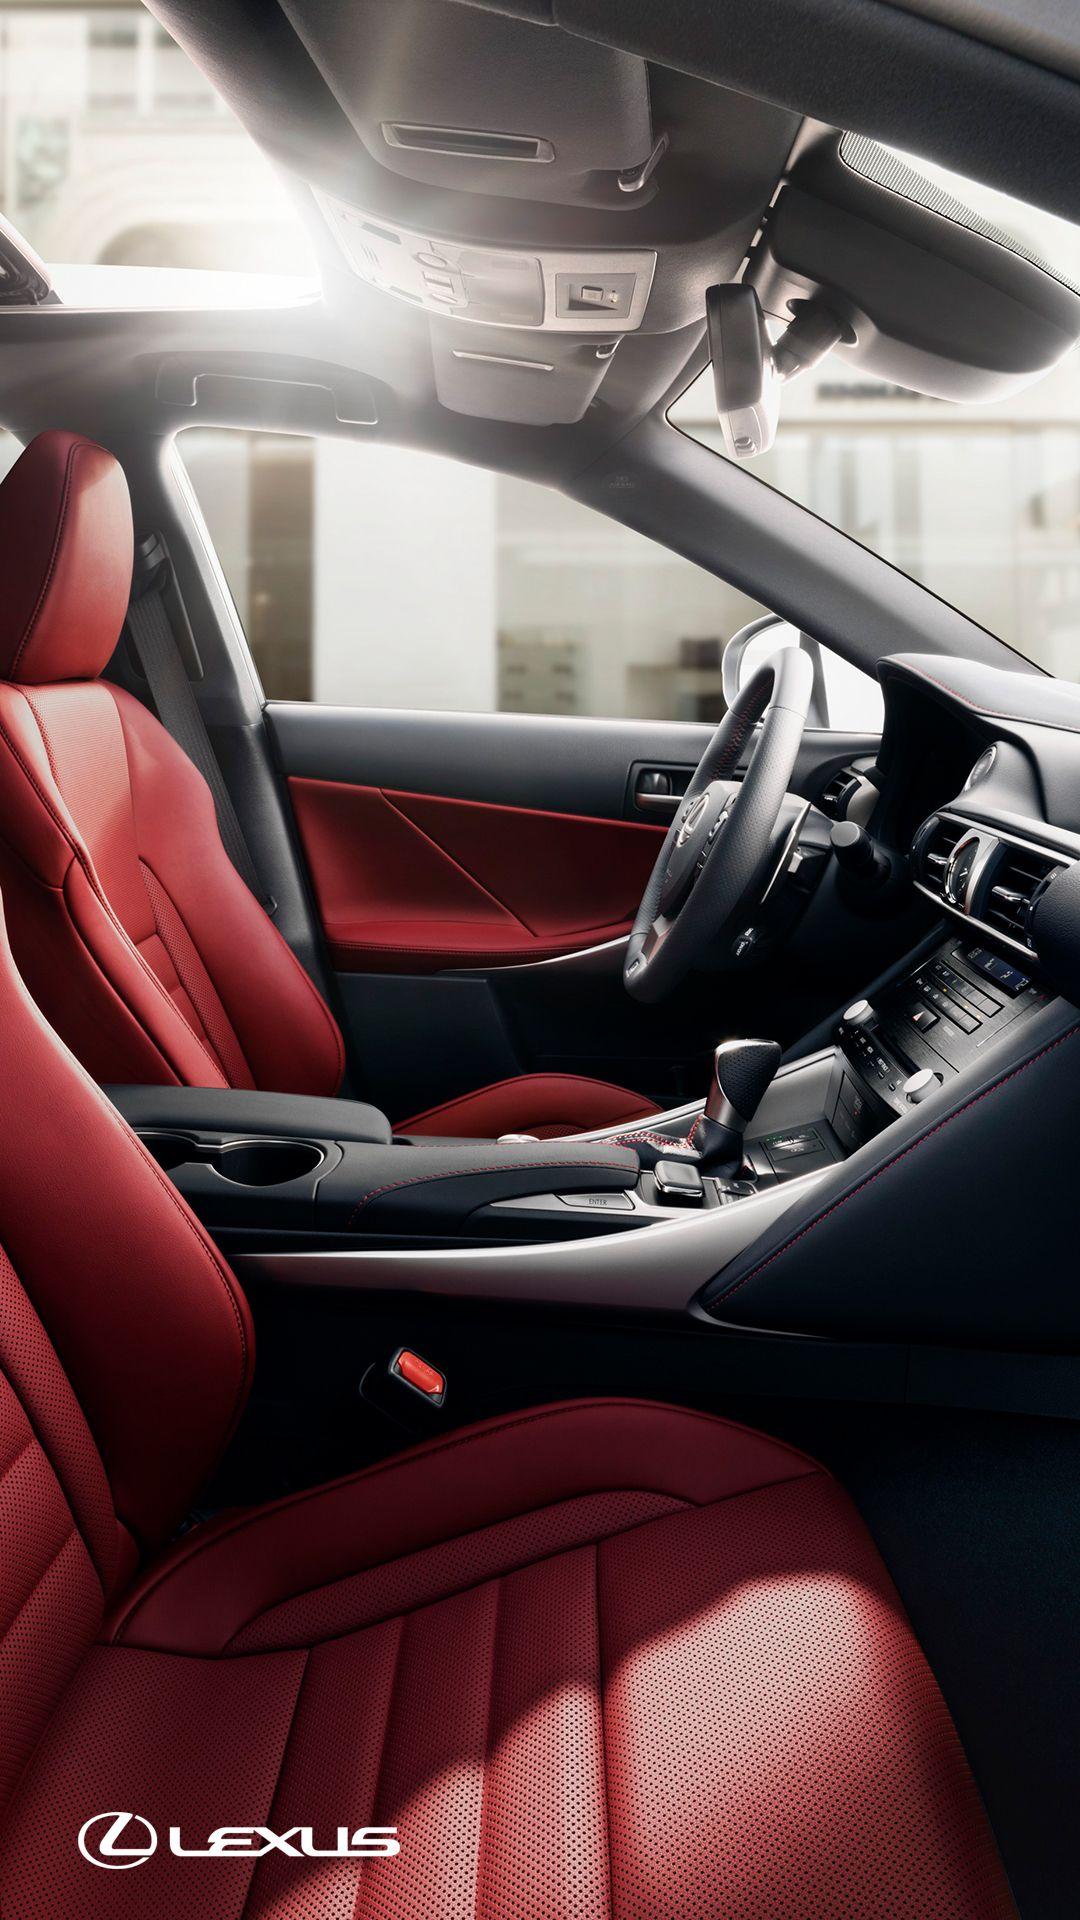 2020 Lexus Rc Newcartestdrive